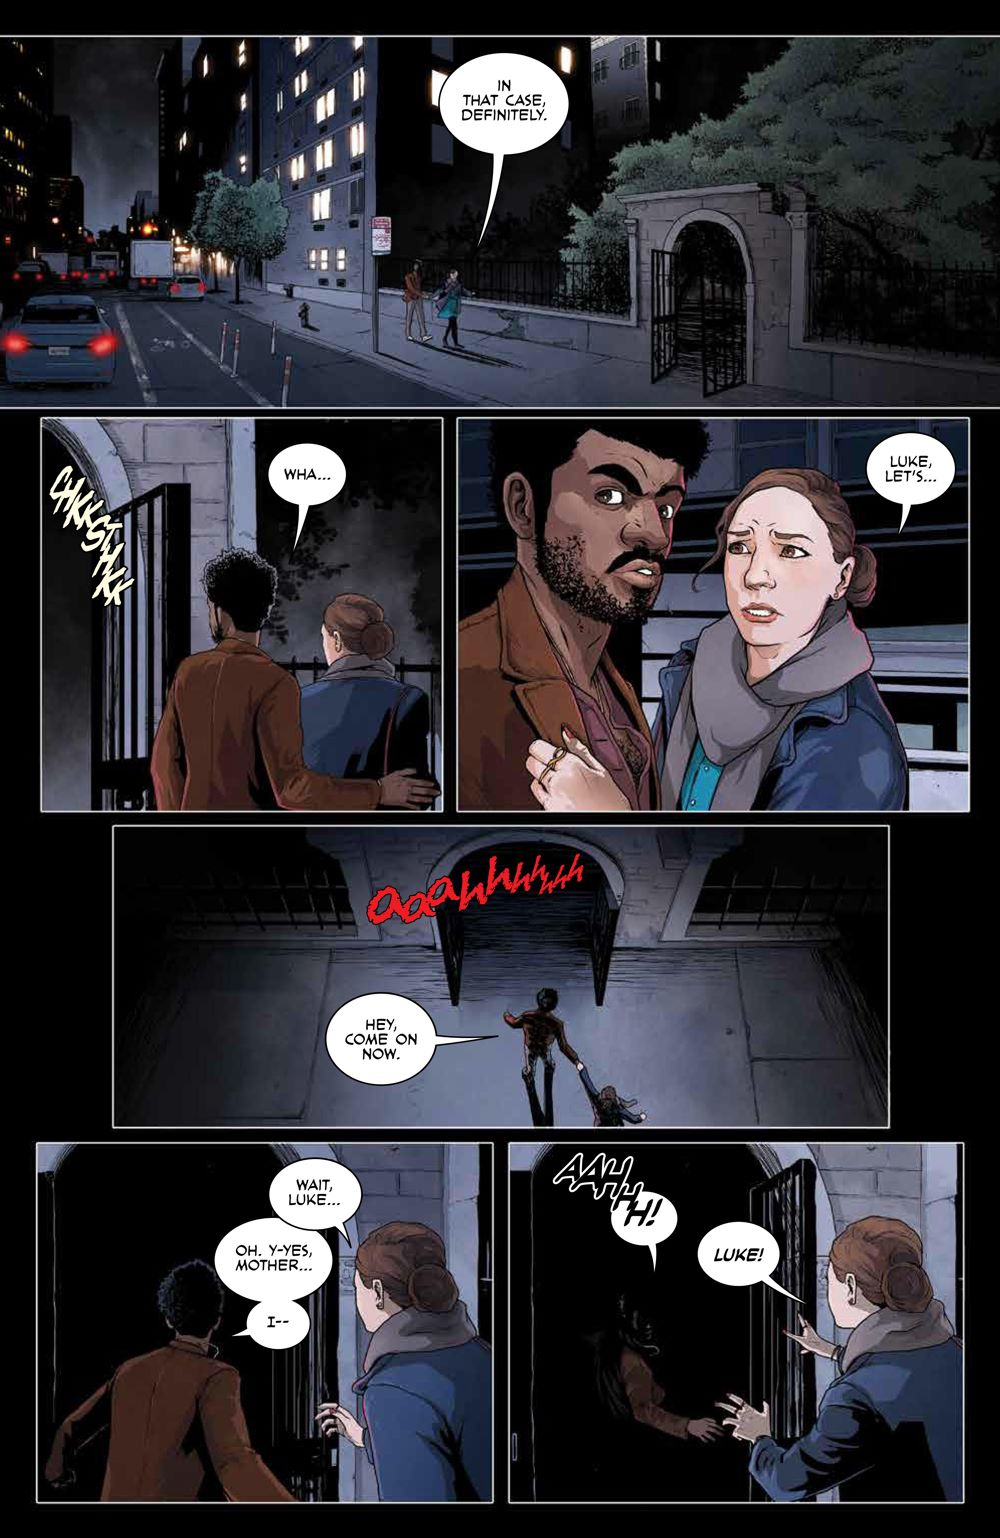 RedMother_v1_SC_PRESS_12 ComicList Previews: RED MOTHER VOLUME 1 TP